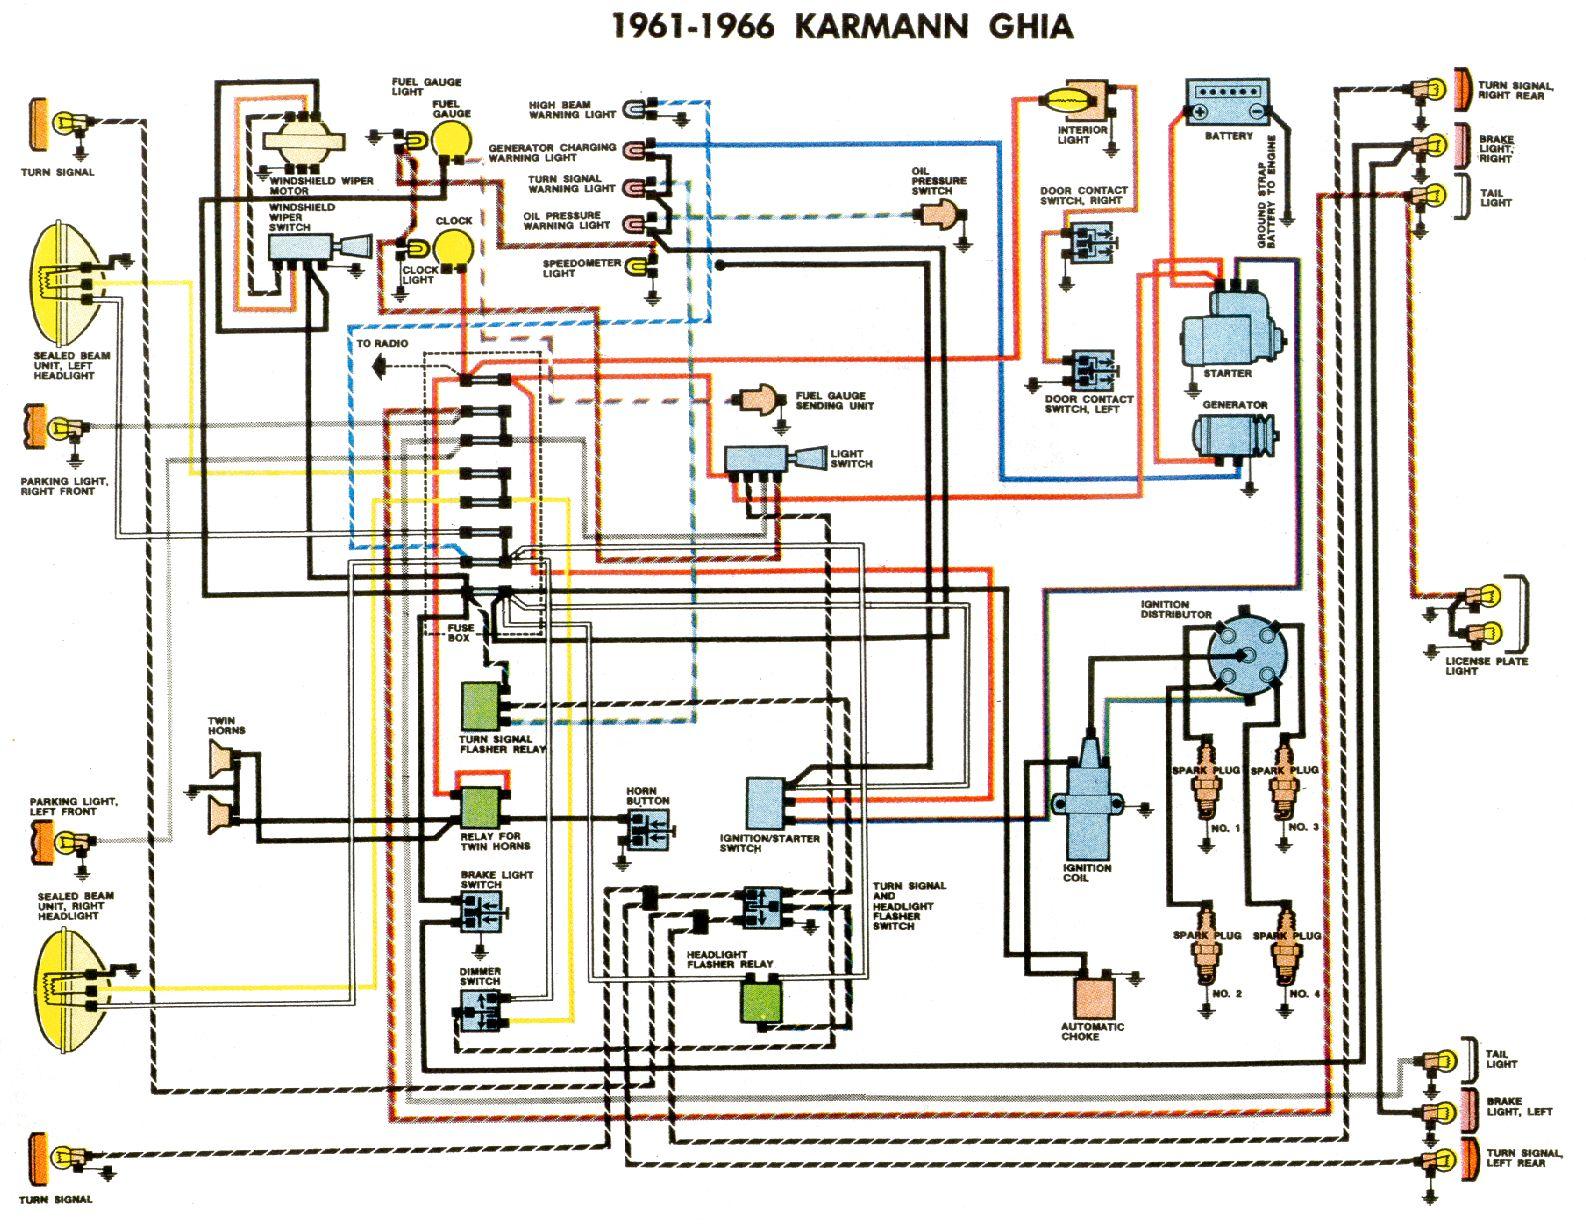 585010?resize\\\\\\\\\\\\\\\=665%2C513\\\\\\\\\\\\\\\&ssl\\\\\\\\\\\\\\\=1 amazing 914 wiring diagram photos wiring schematic tvservice us rotax 912 wiring schematic at fashall.co